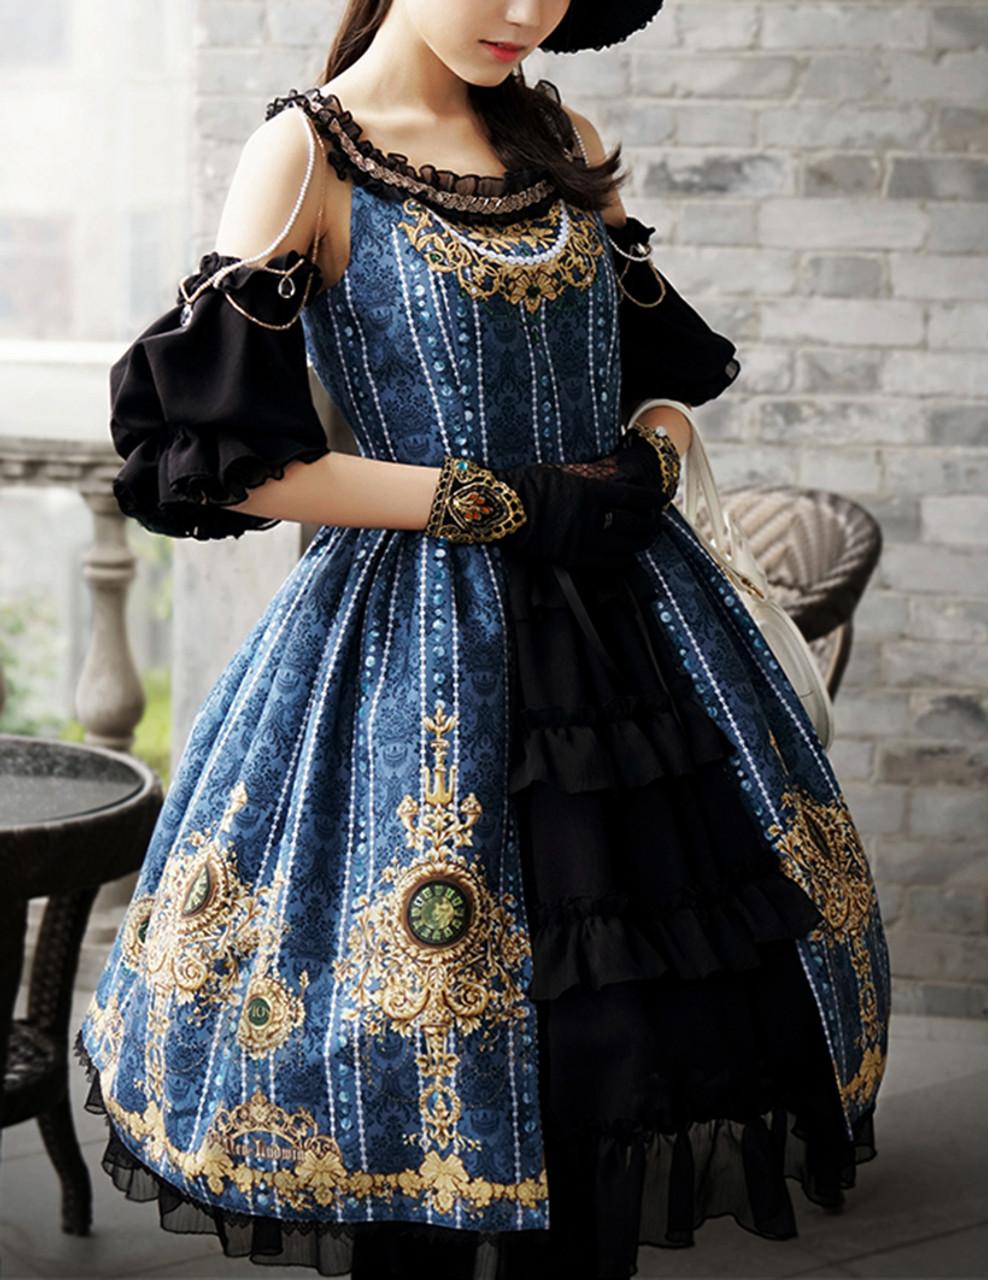 Last Chance  Lolita Fashion Ball Dress Chic Rococo Off the Shoulder Gold  Print Dress  burgundy d77e58a24b8c